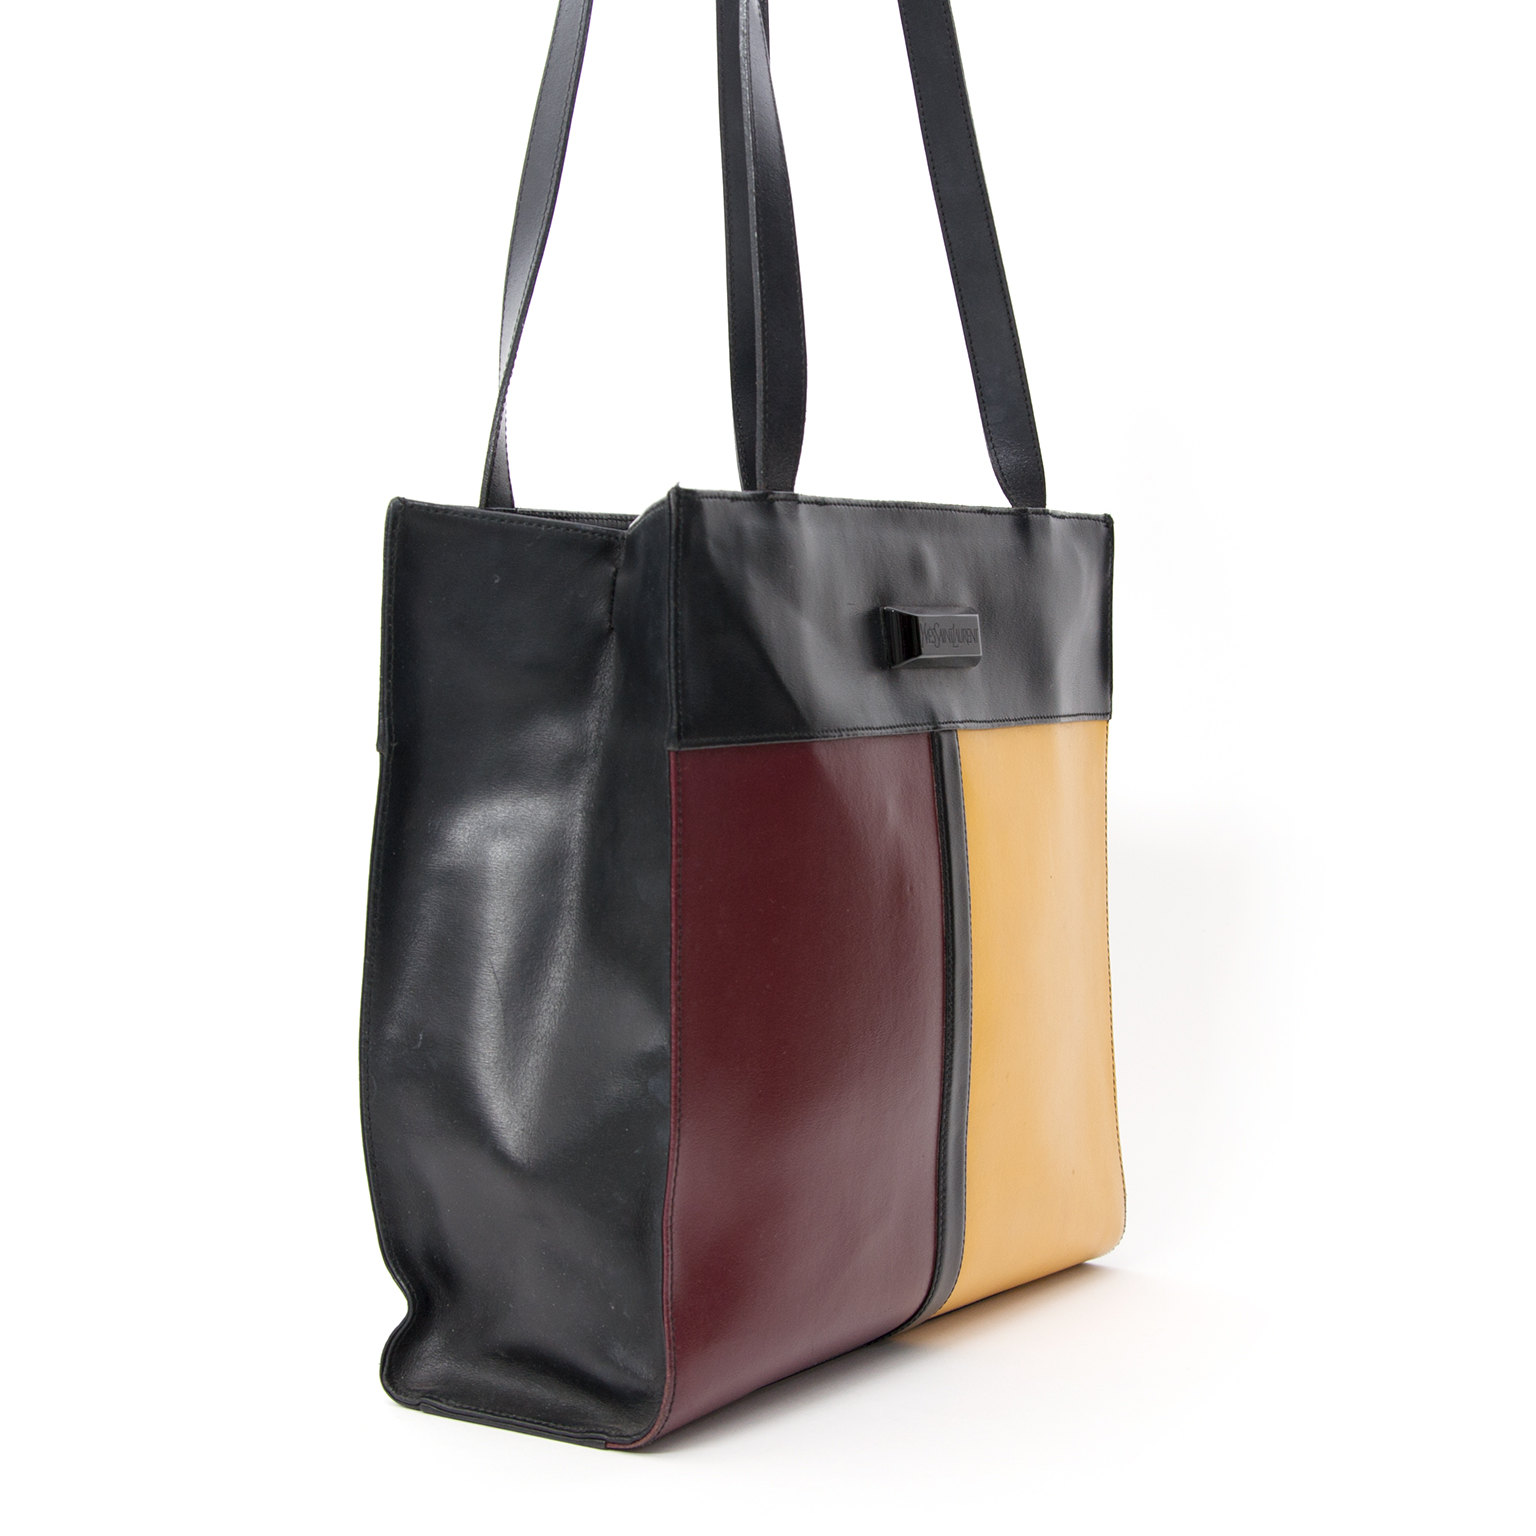 Buy authentic vintage Yves Saint Laurent online. Vind tweedehands ...